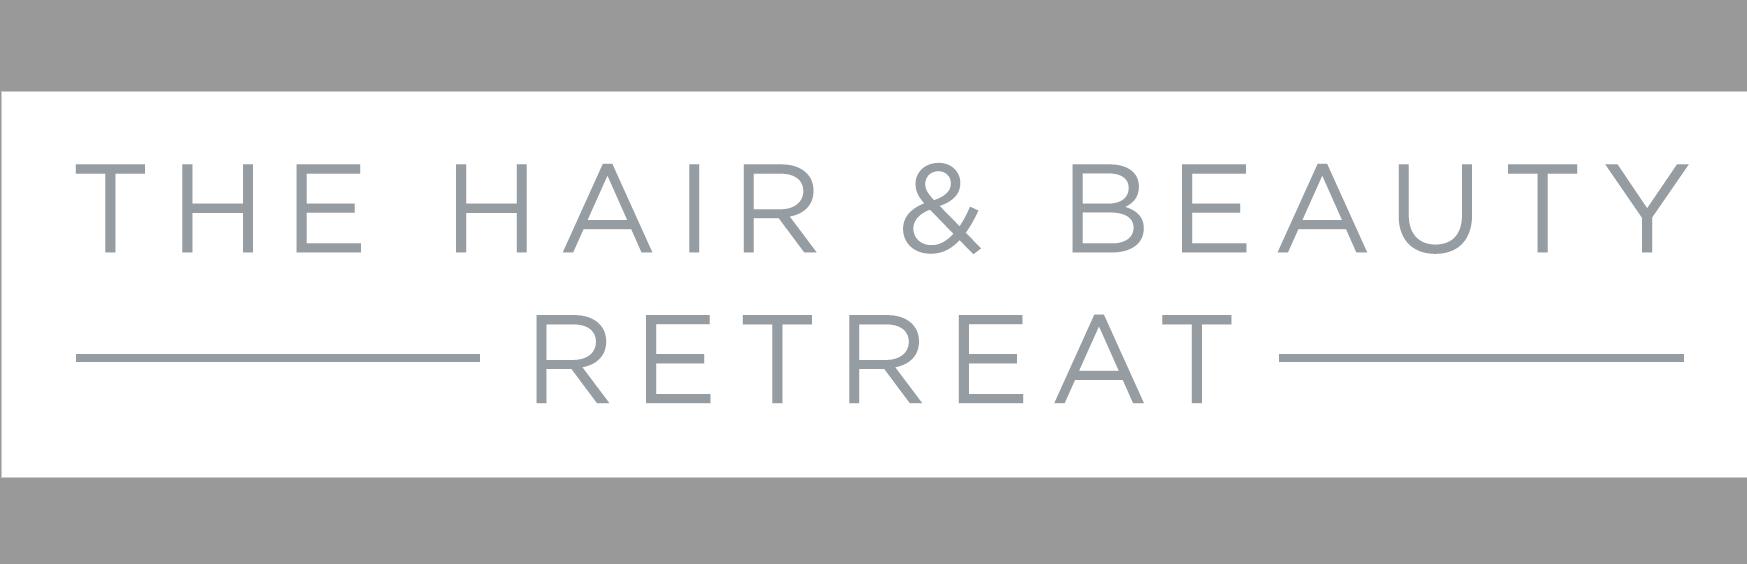 The Hair & Beauty Retreat